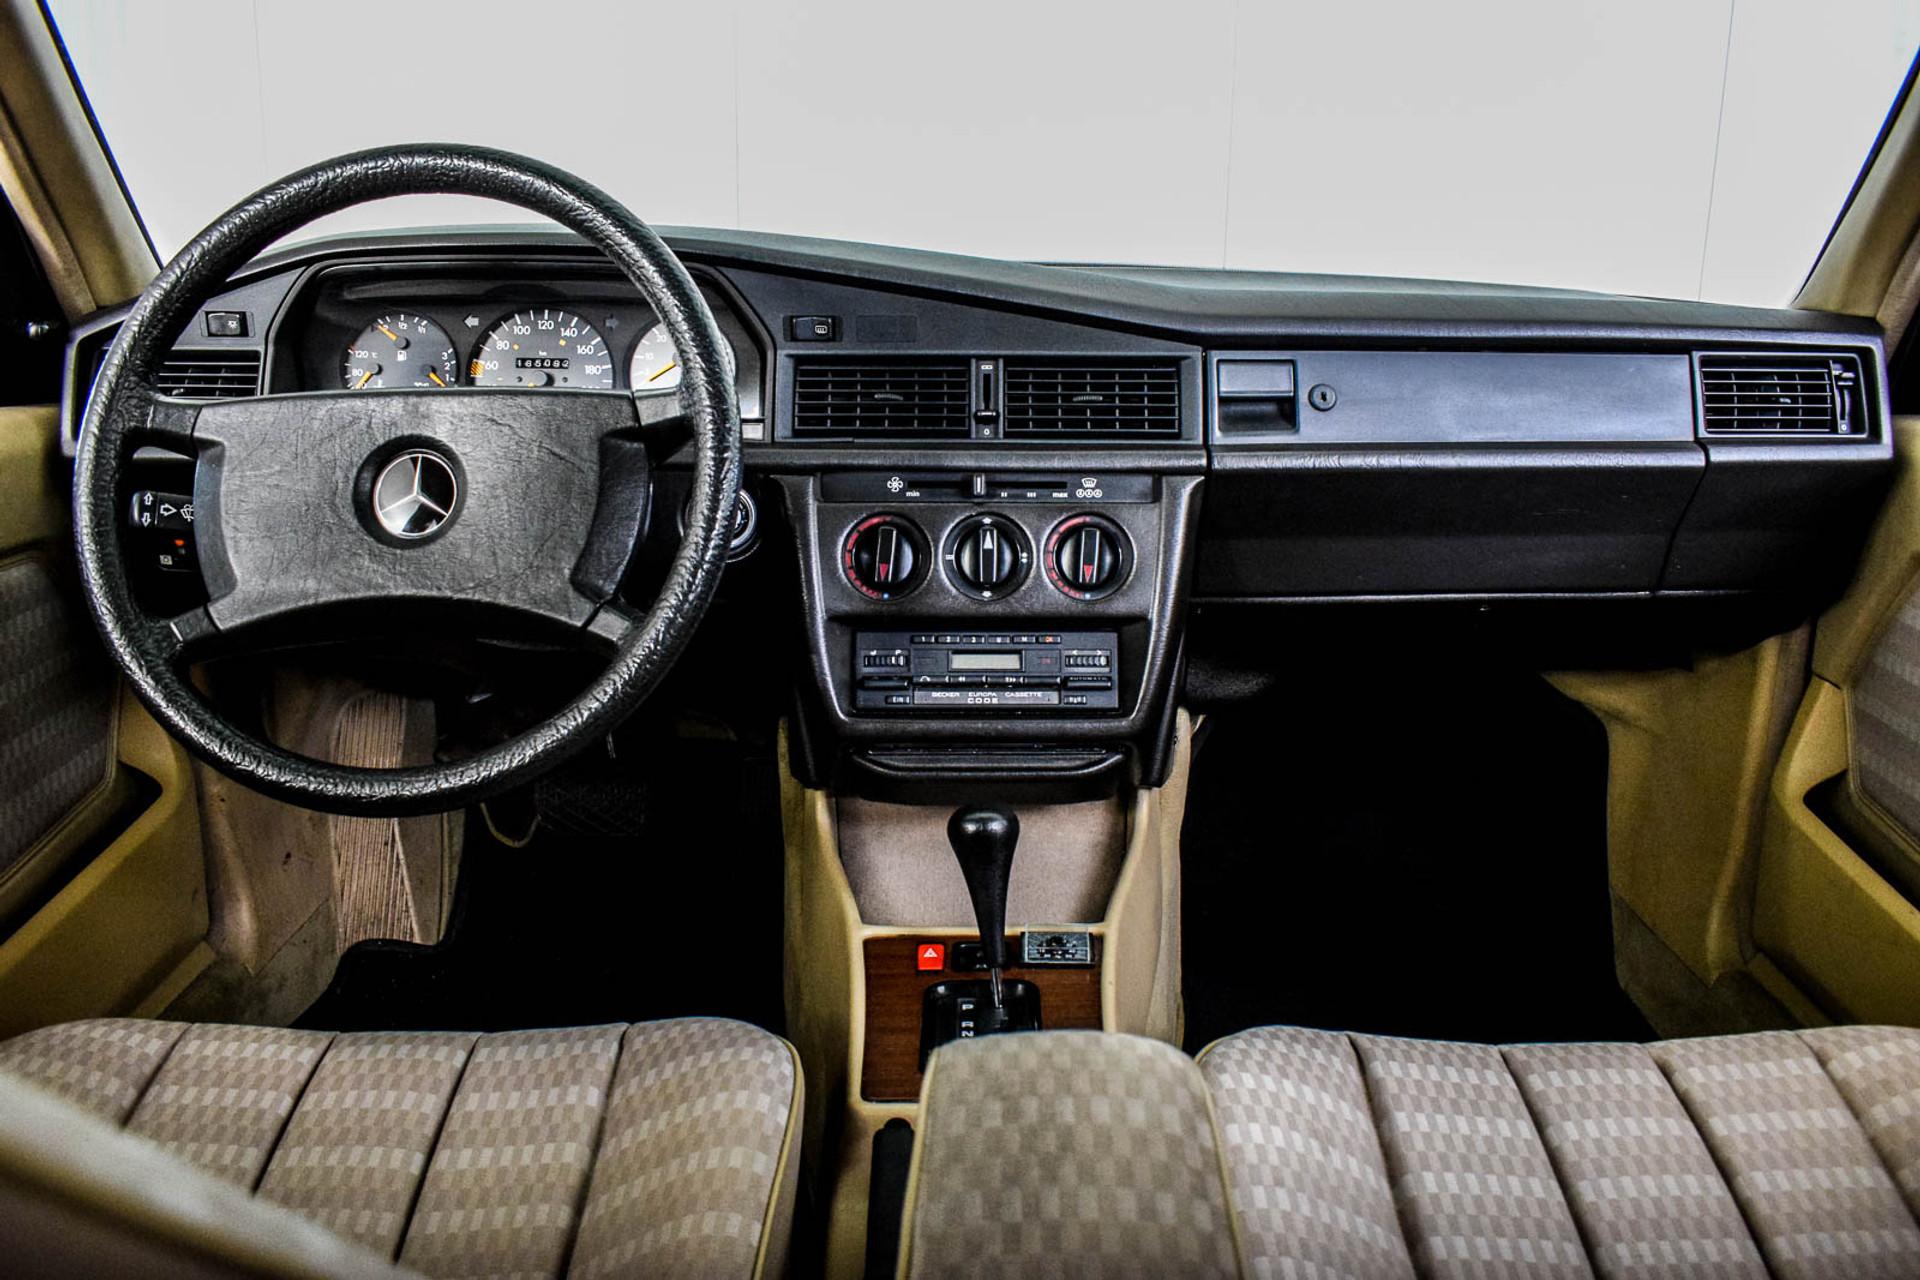 Mercedes-Benz 190 2.5 D Turbo Diesel Foto 7